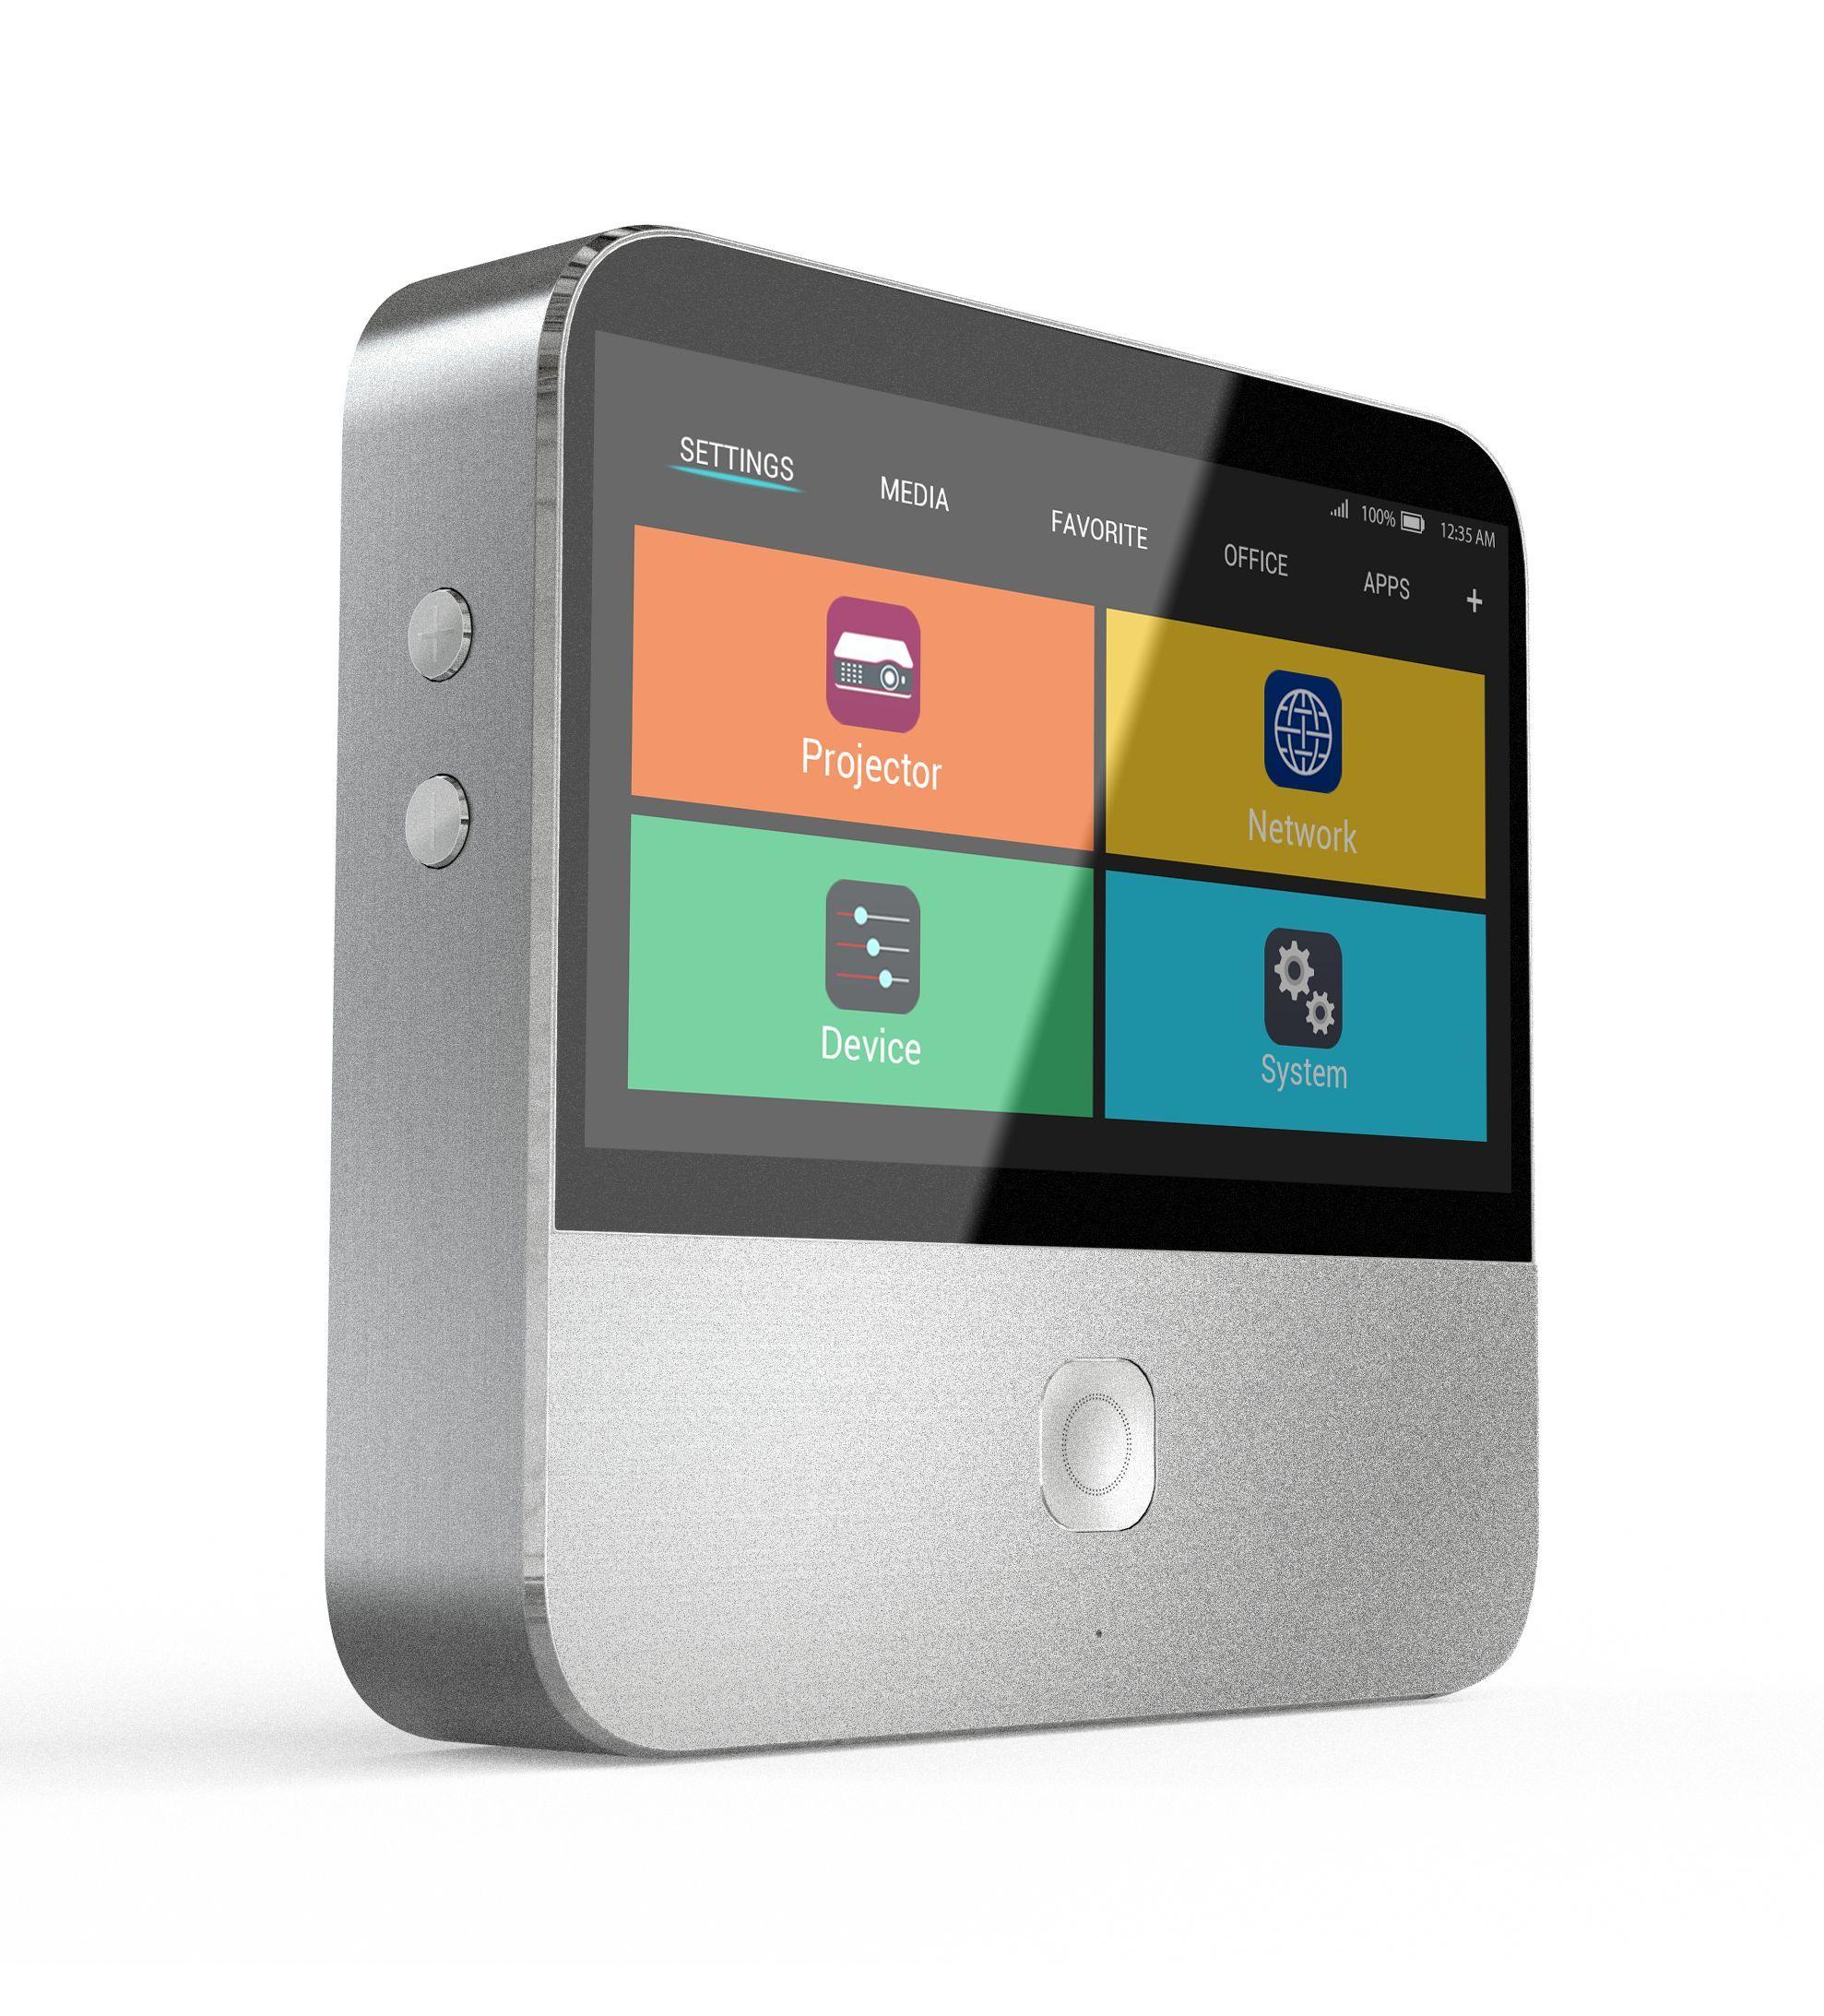 5-inch gadget zte spro 2 resolution SuperCloud Song